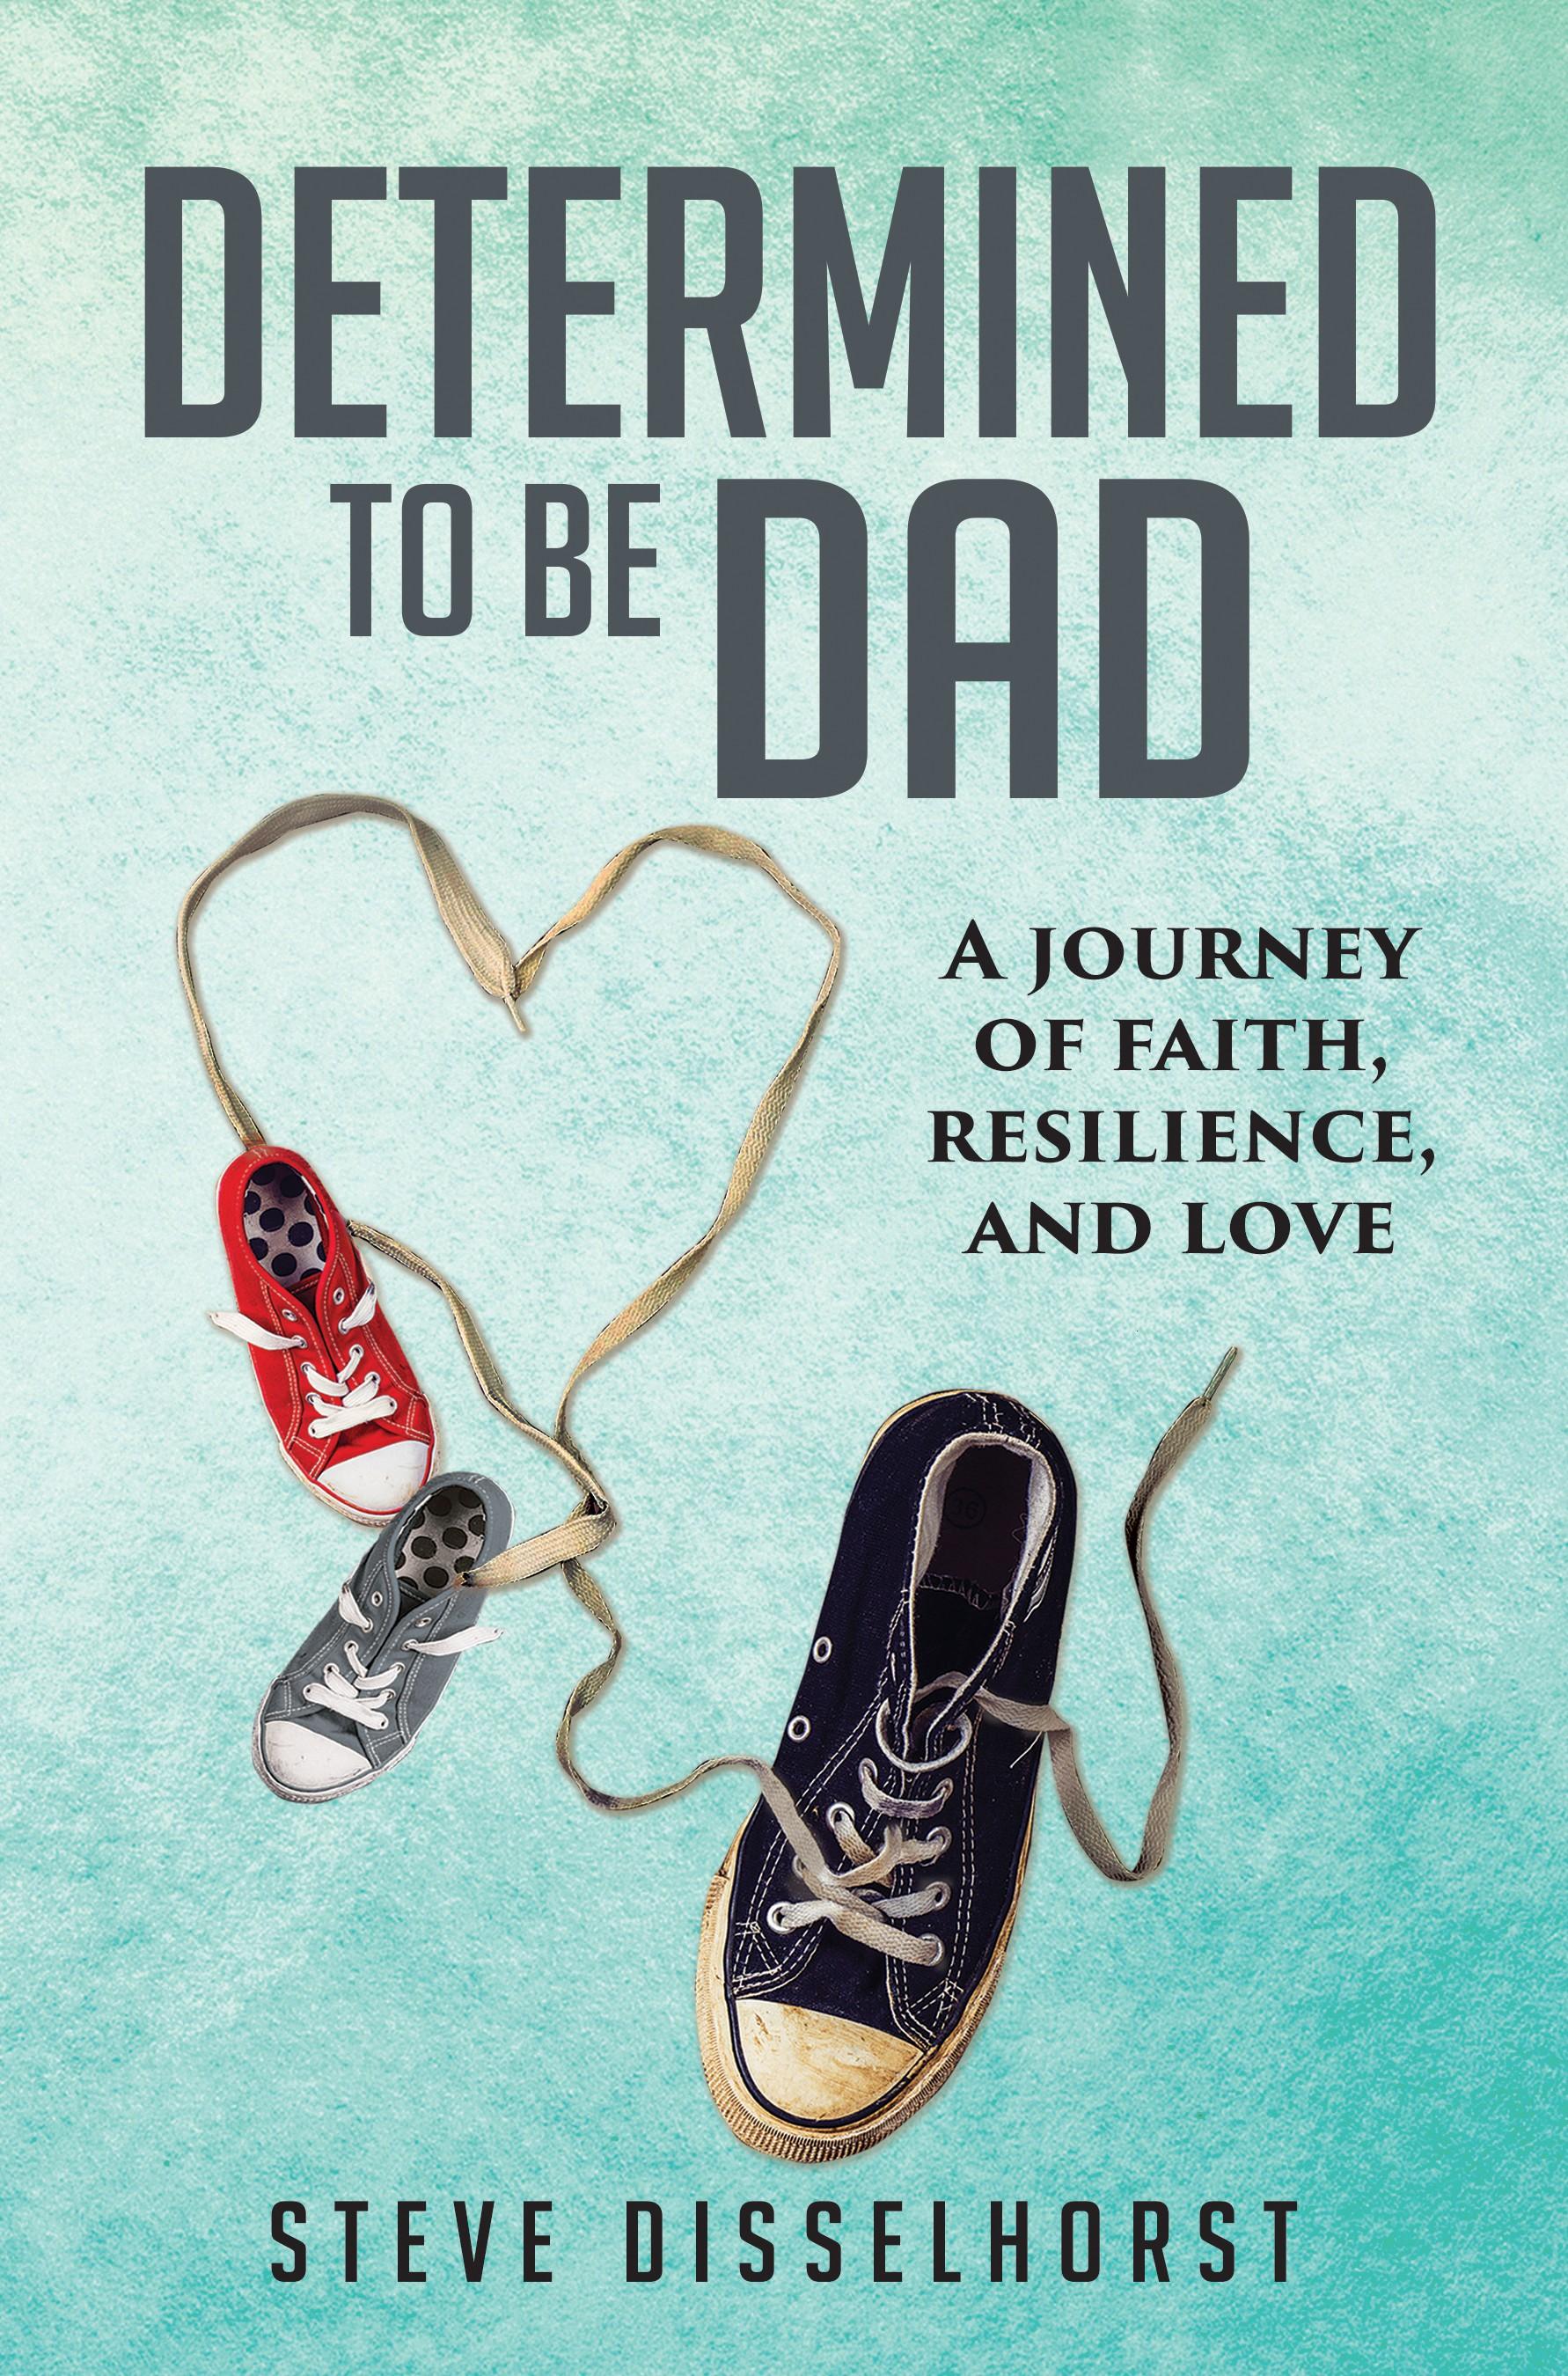 Design a book cover for a memoir about a man's lifelong dream to become a dad